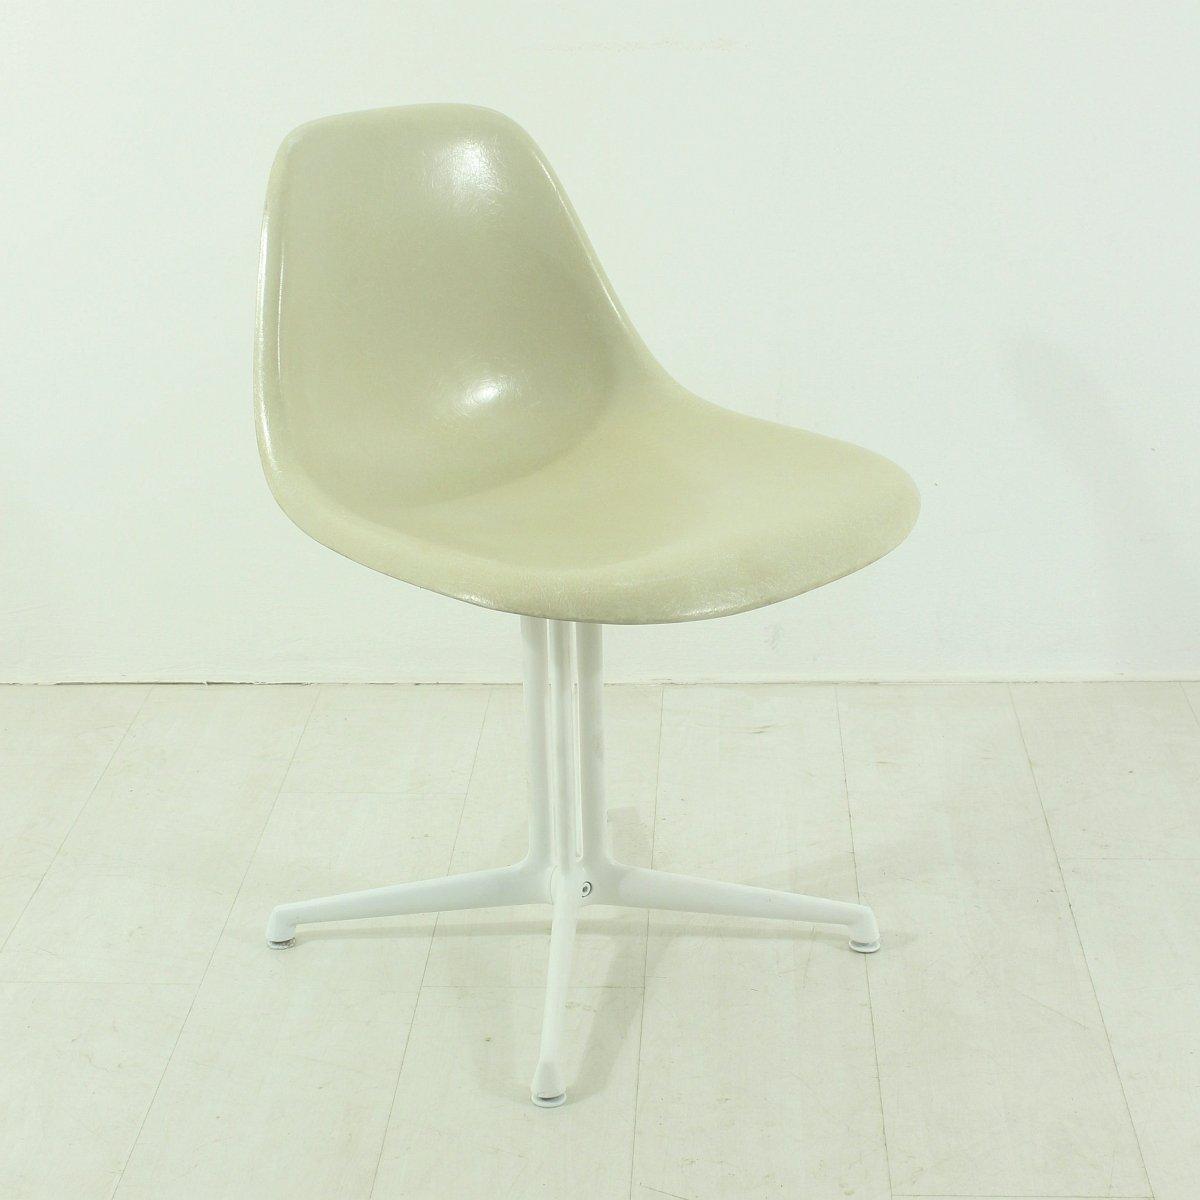 cremefarbener la fonda stuhl von charles und ray eames f r vitra bei pamono kaufen. Black Bedroom Furniture Sets. Home Design Ideas